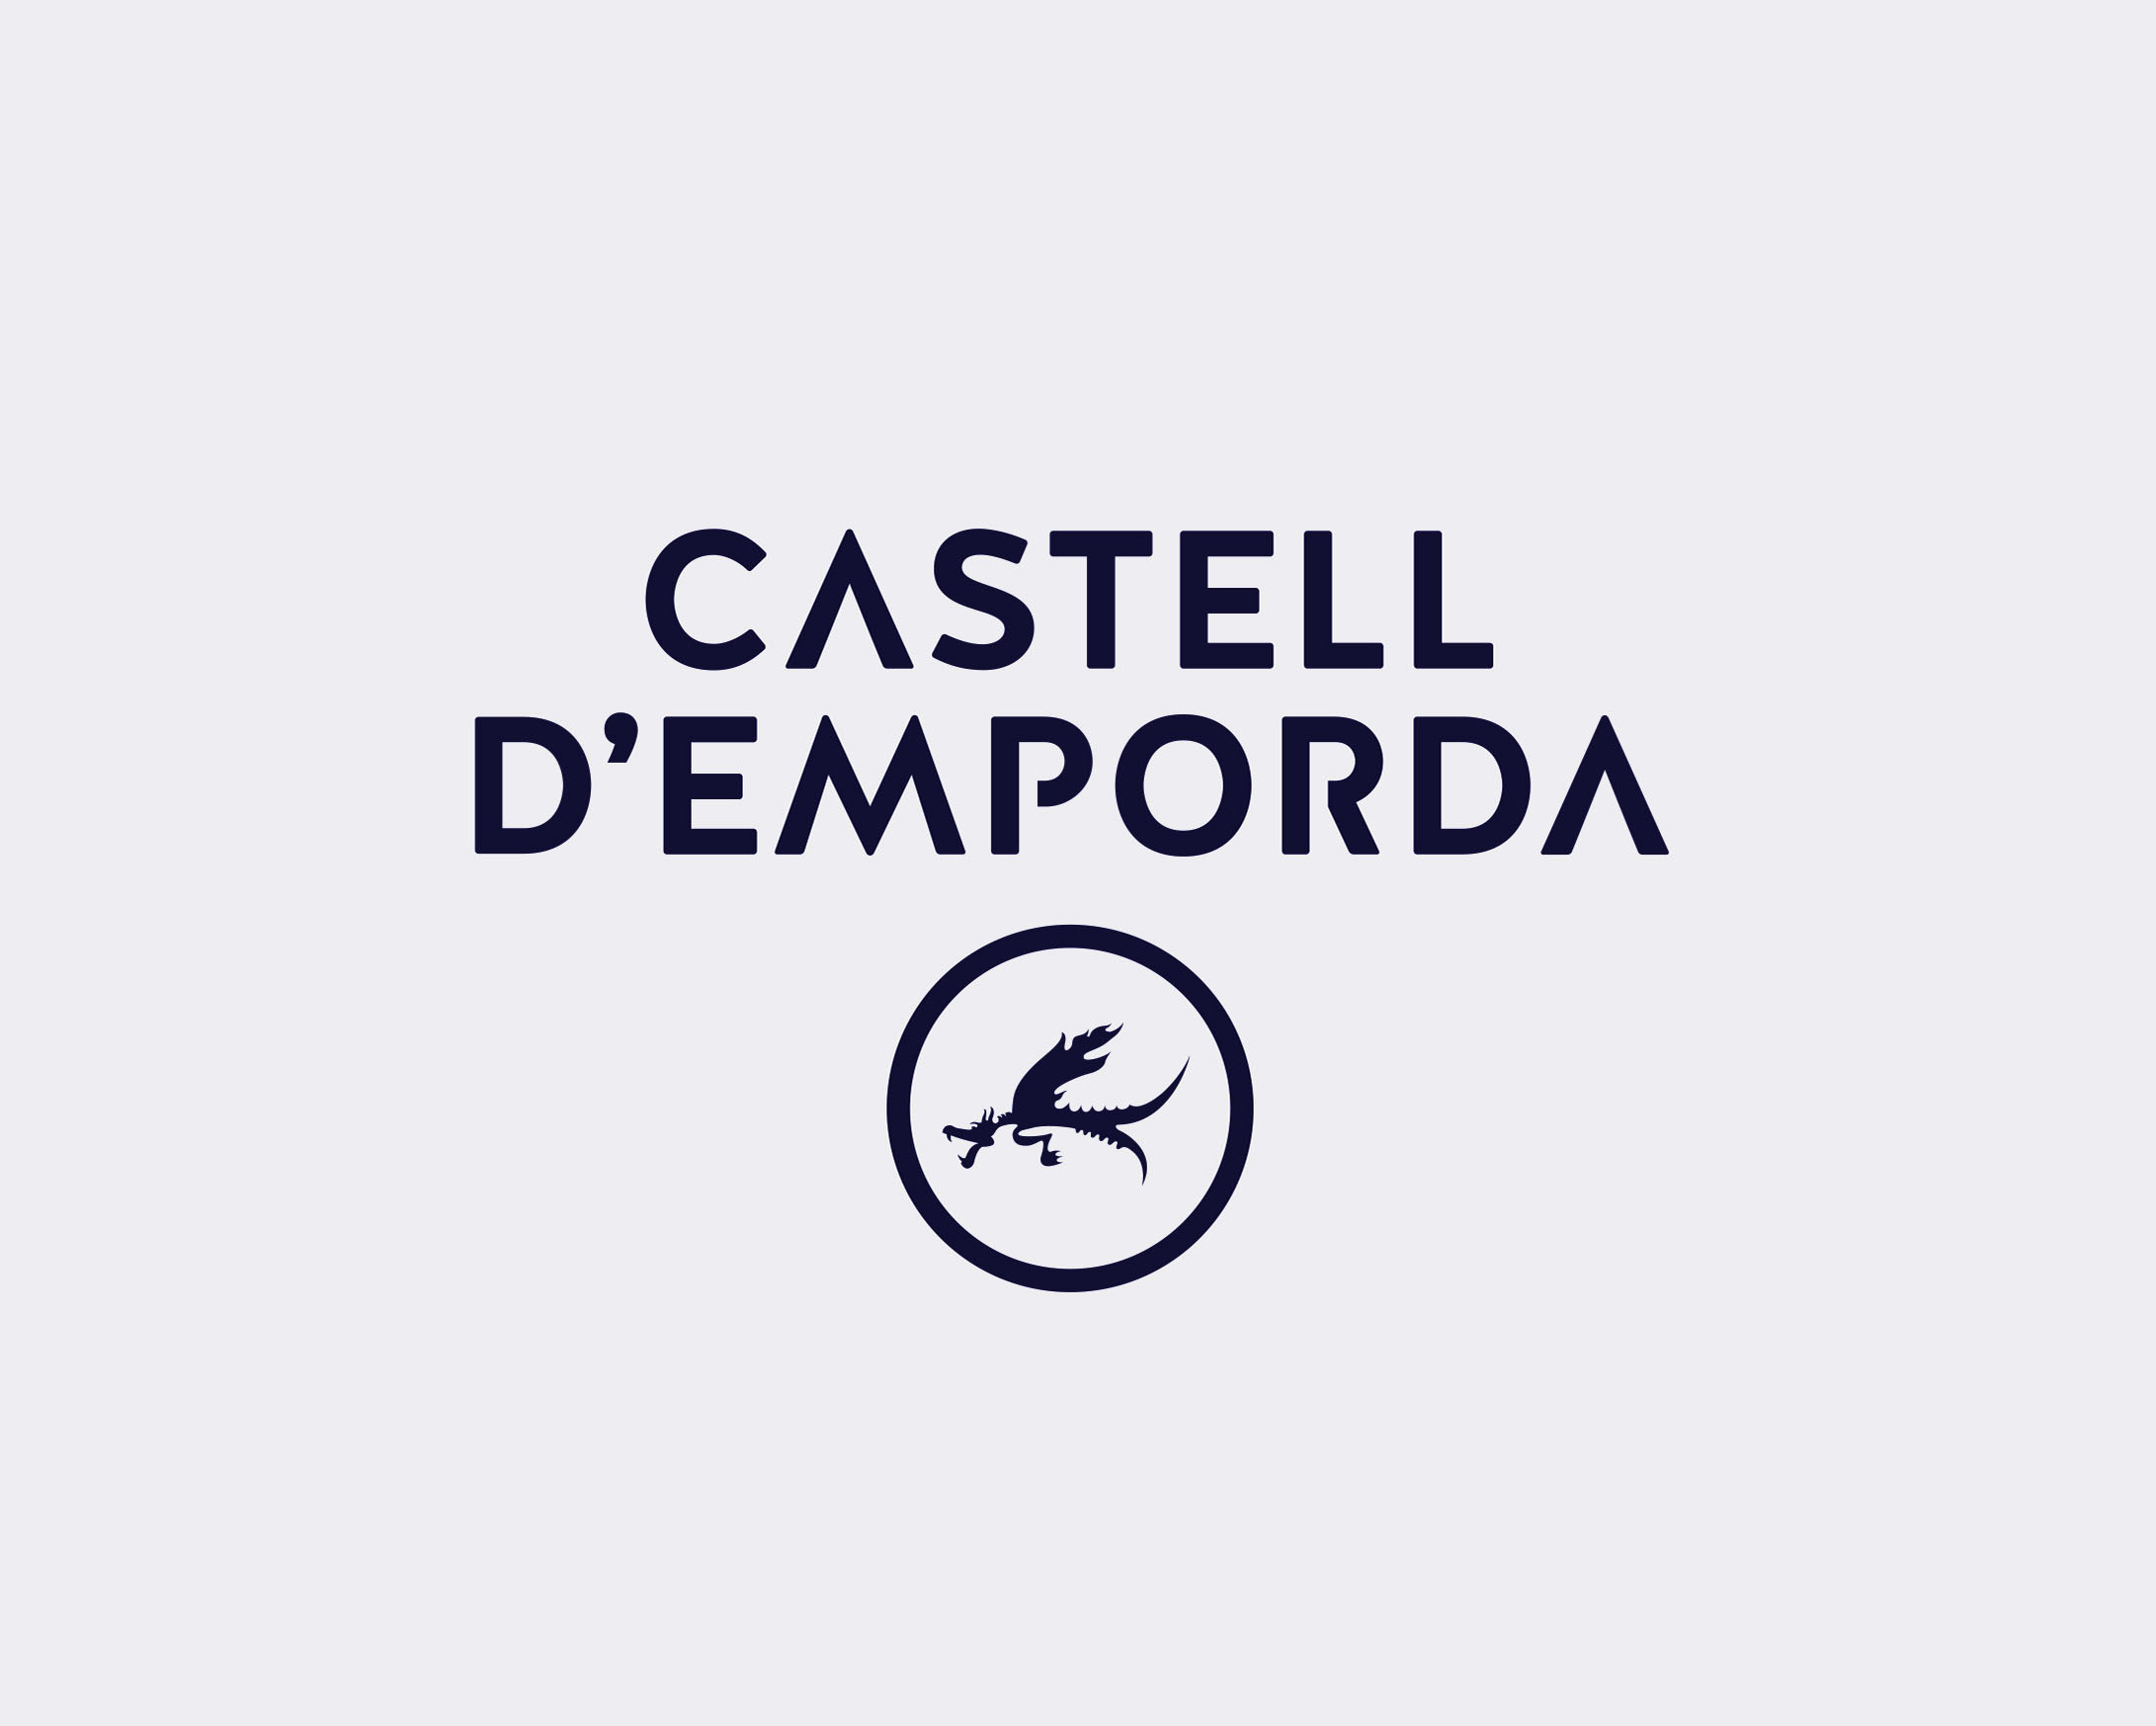 castell-02